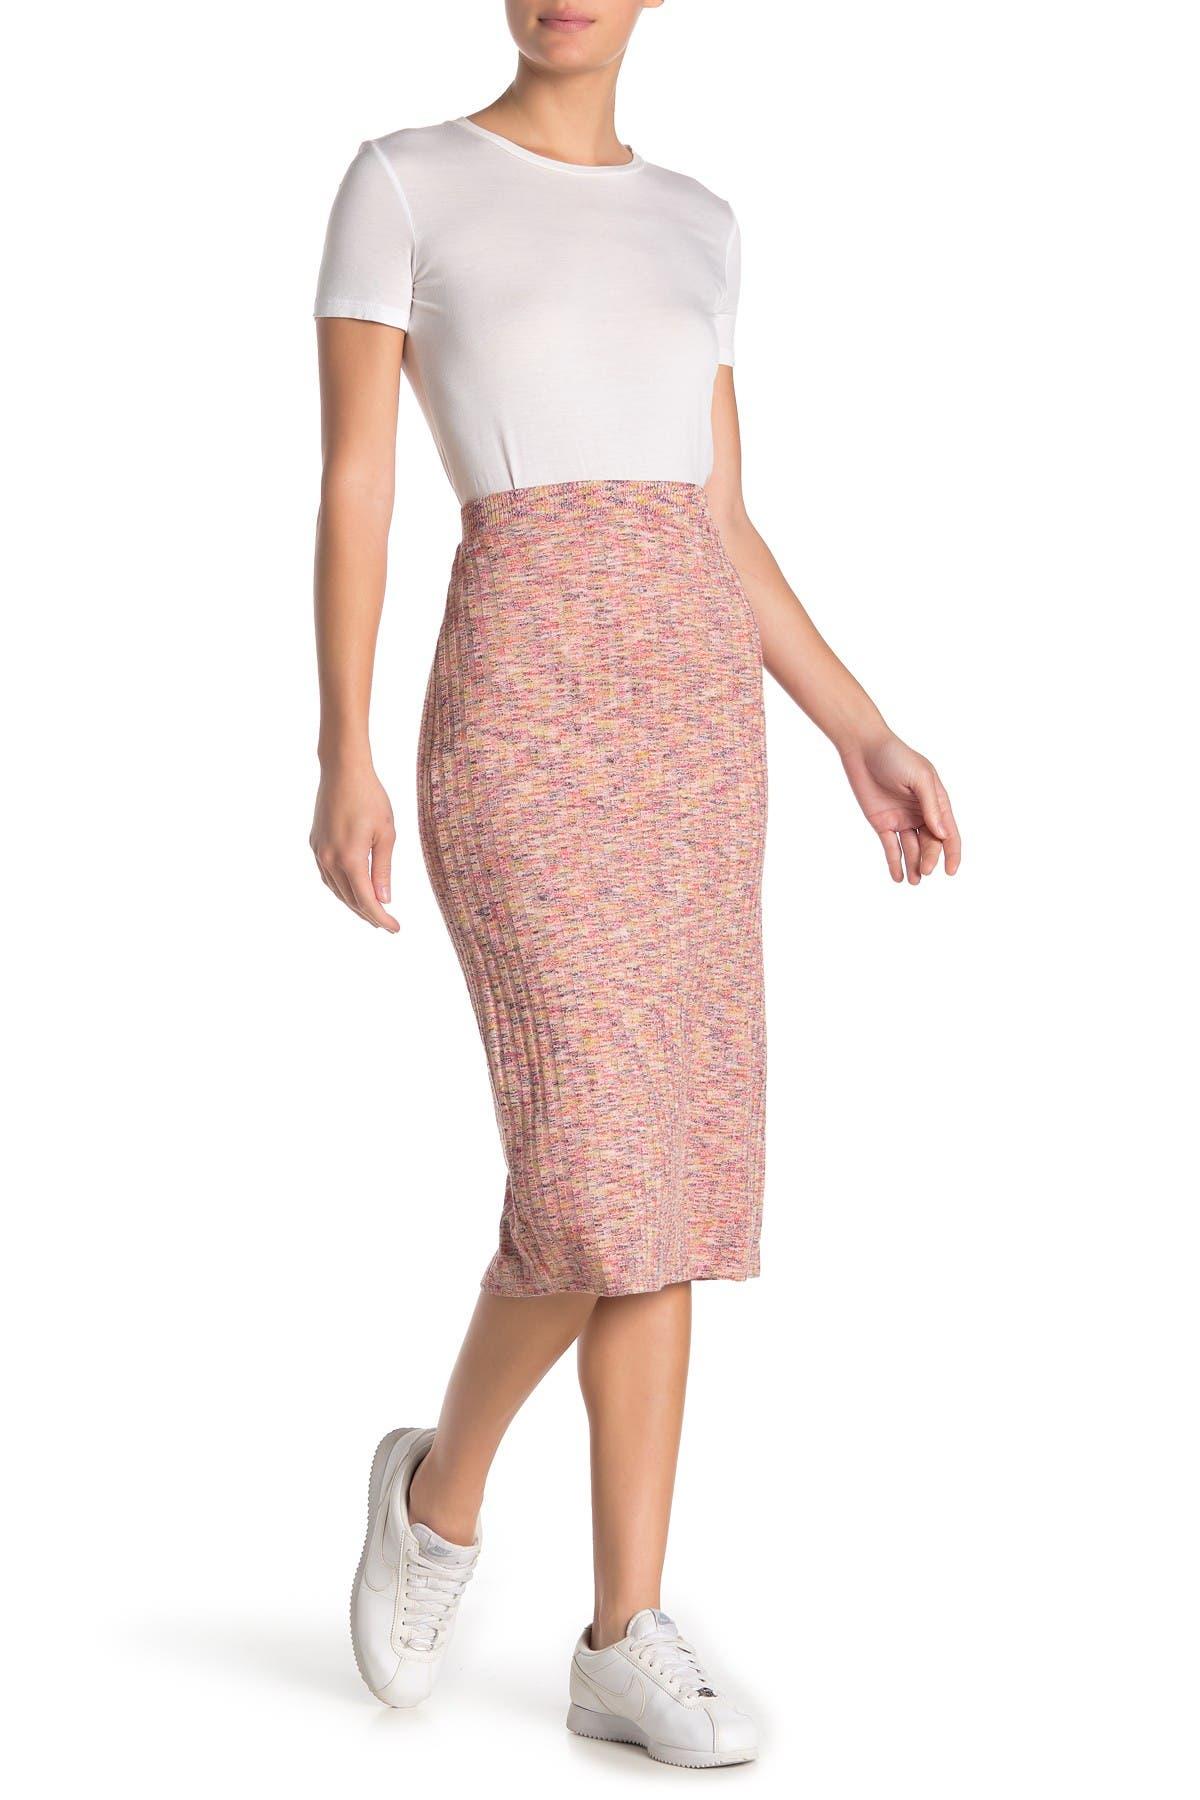 Image of 14th & Union Rib Melange Midi Skirt